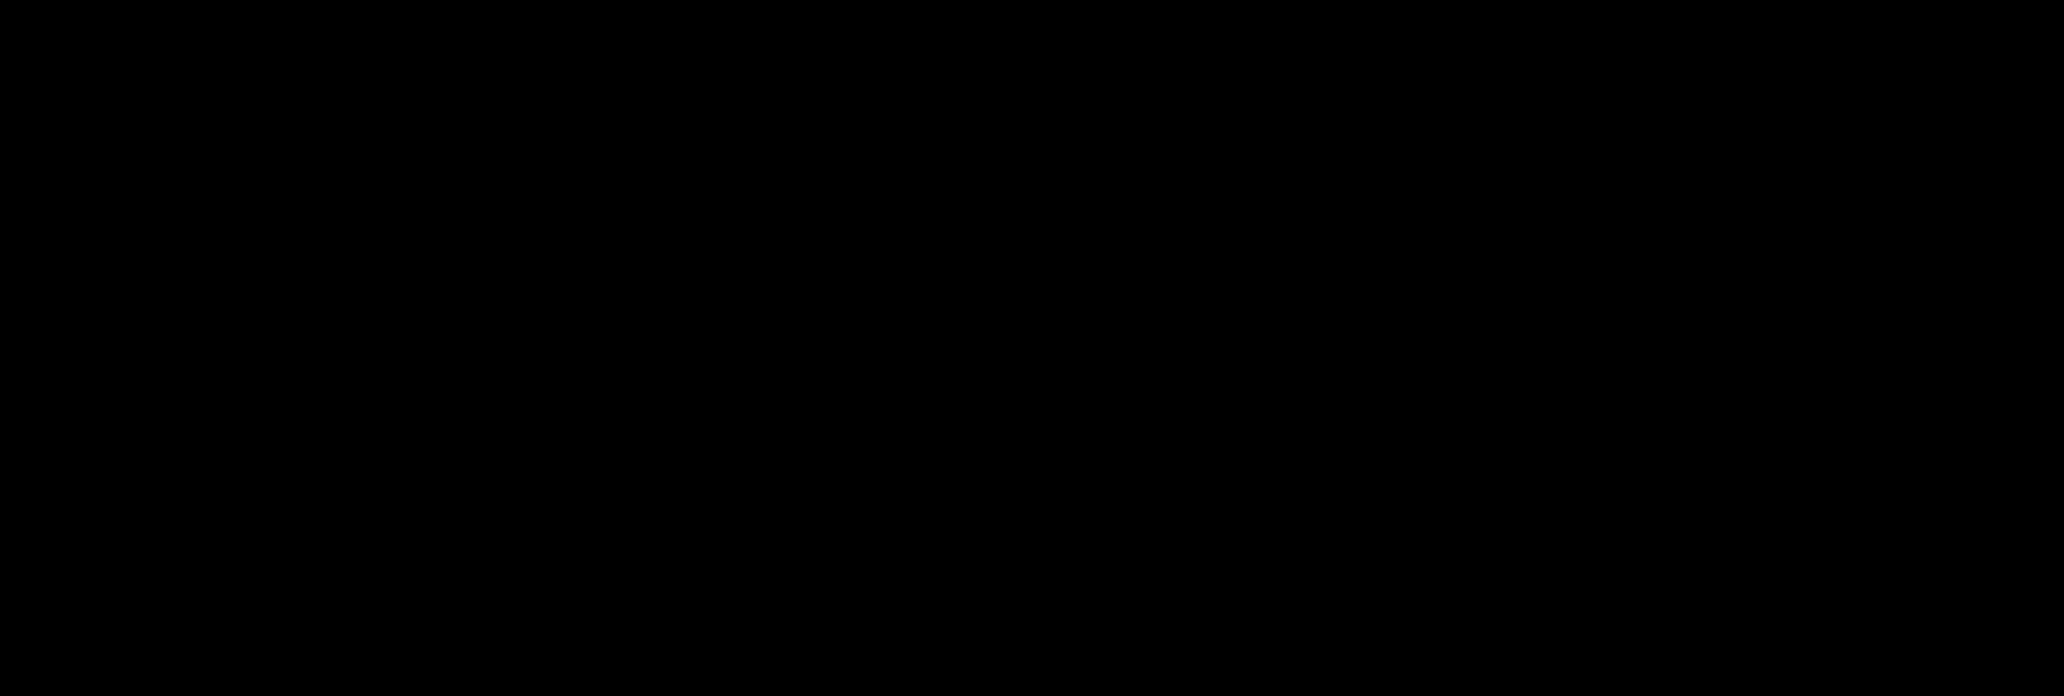 Capsaicin-d<sub>3</sub>